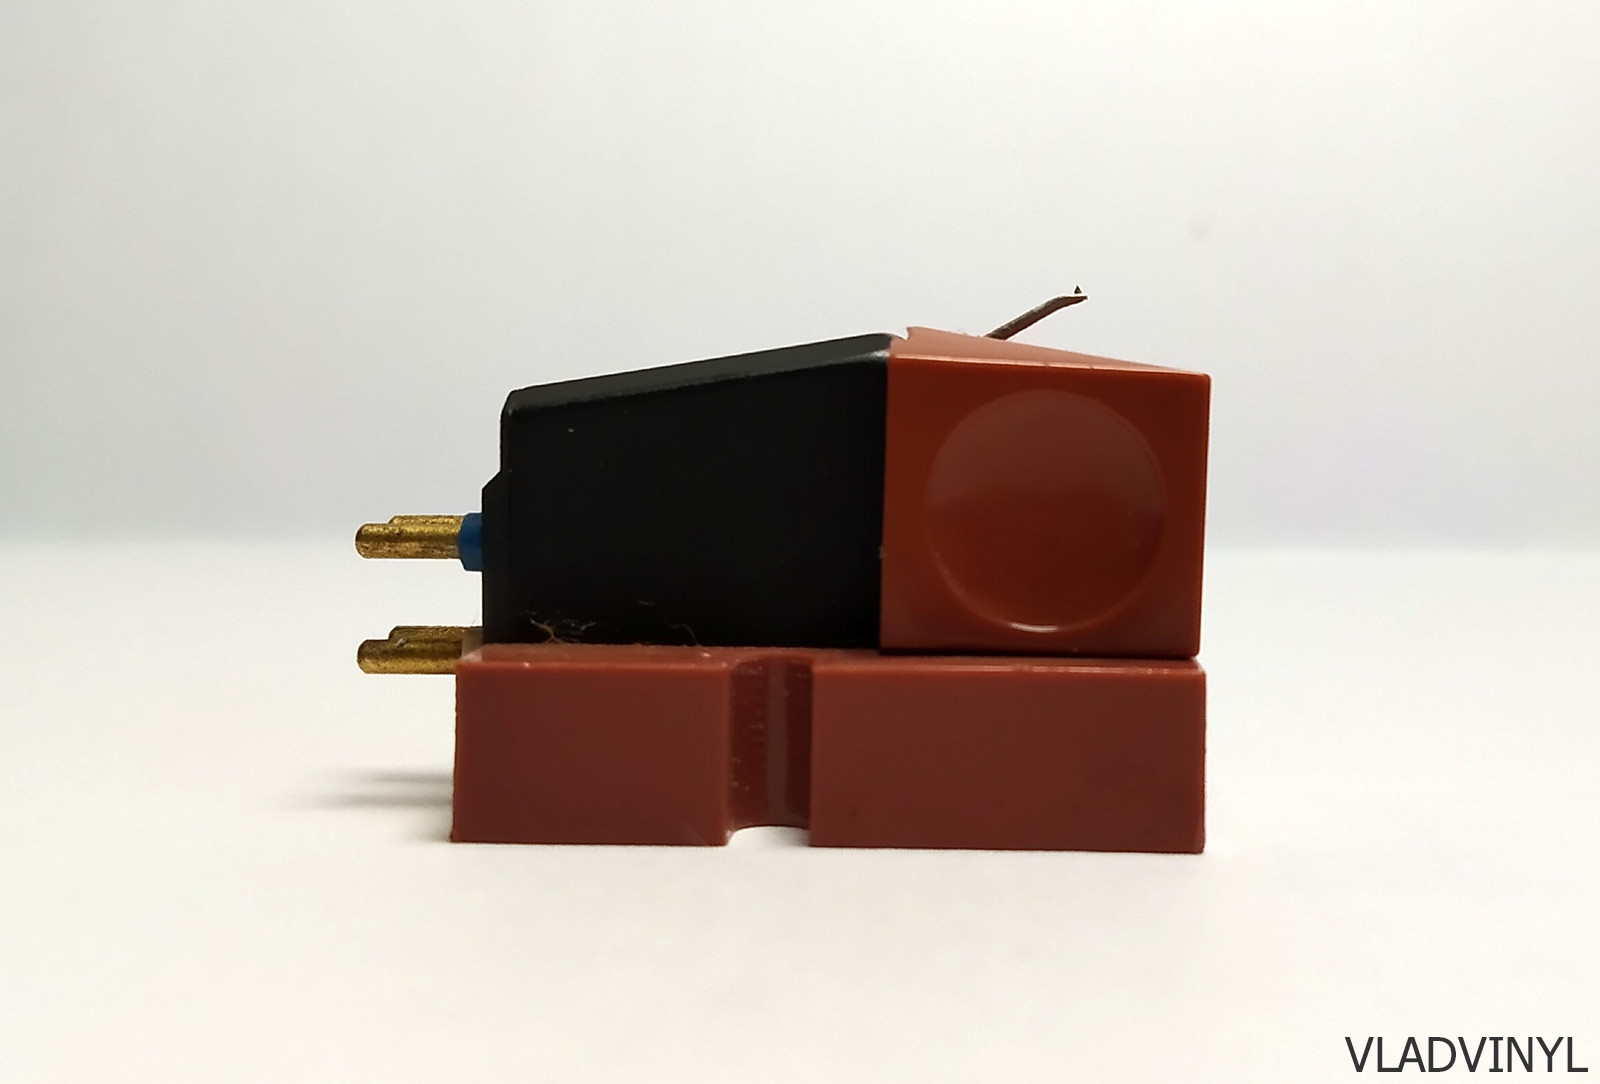 Головка звукоснимателя Jeweltone MP-10J